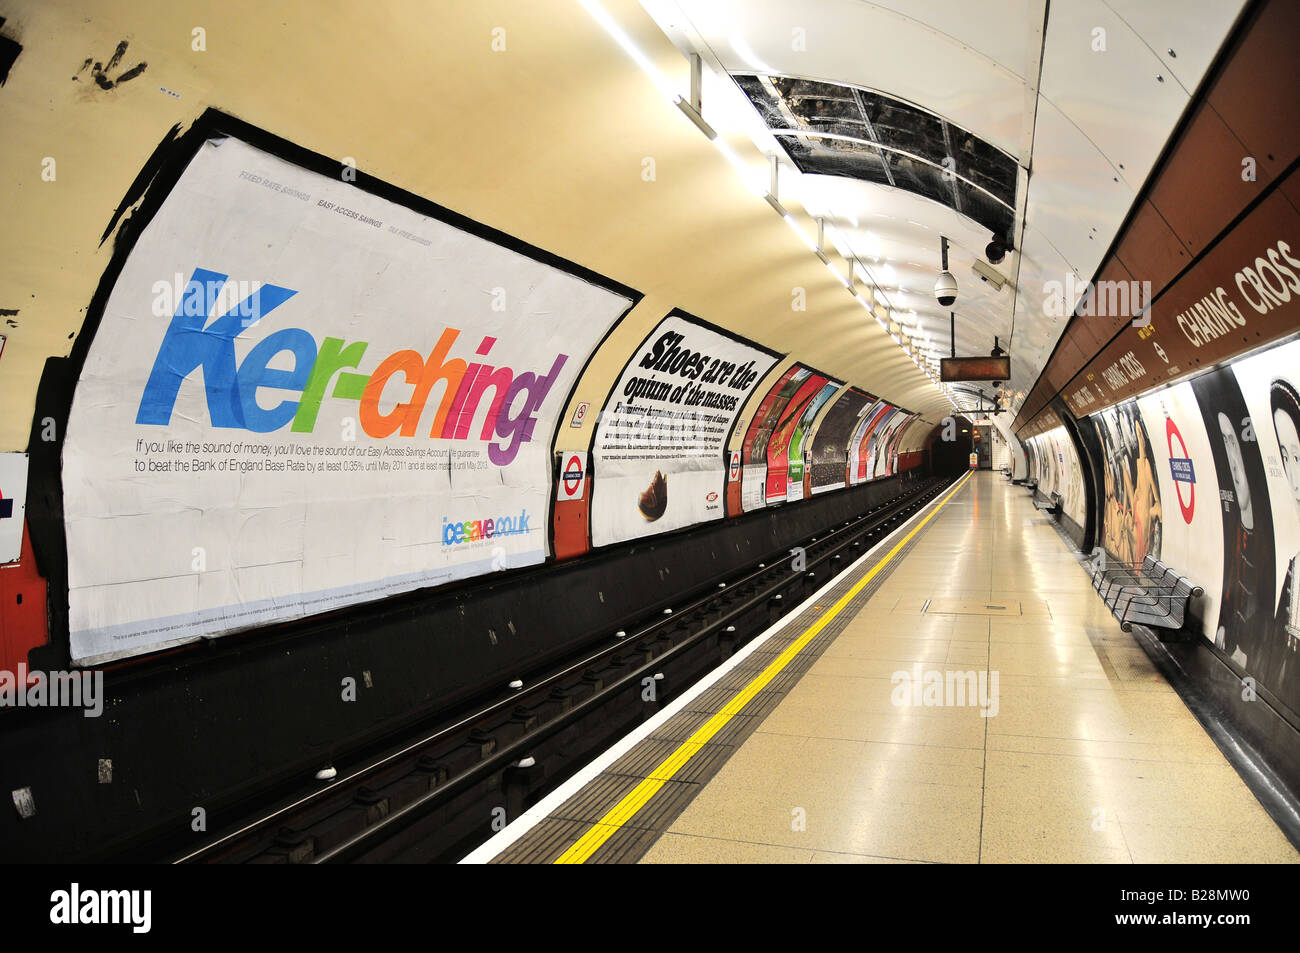 Posters at Charing Cross tube station, London, UK - Stock Image